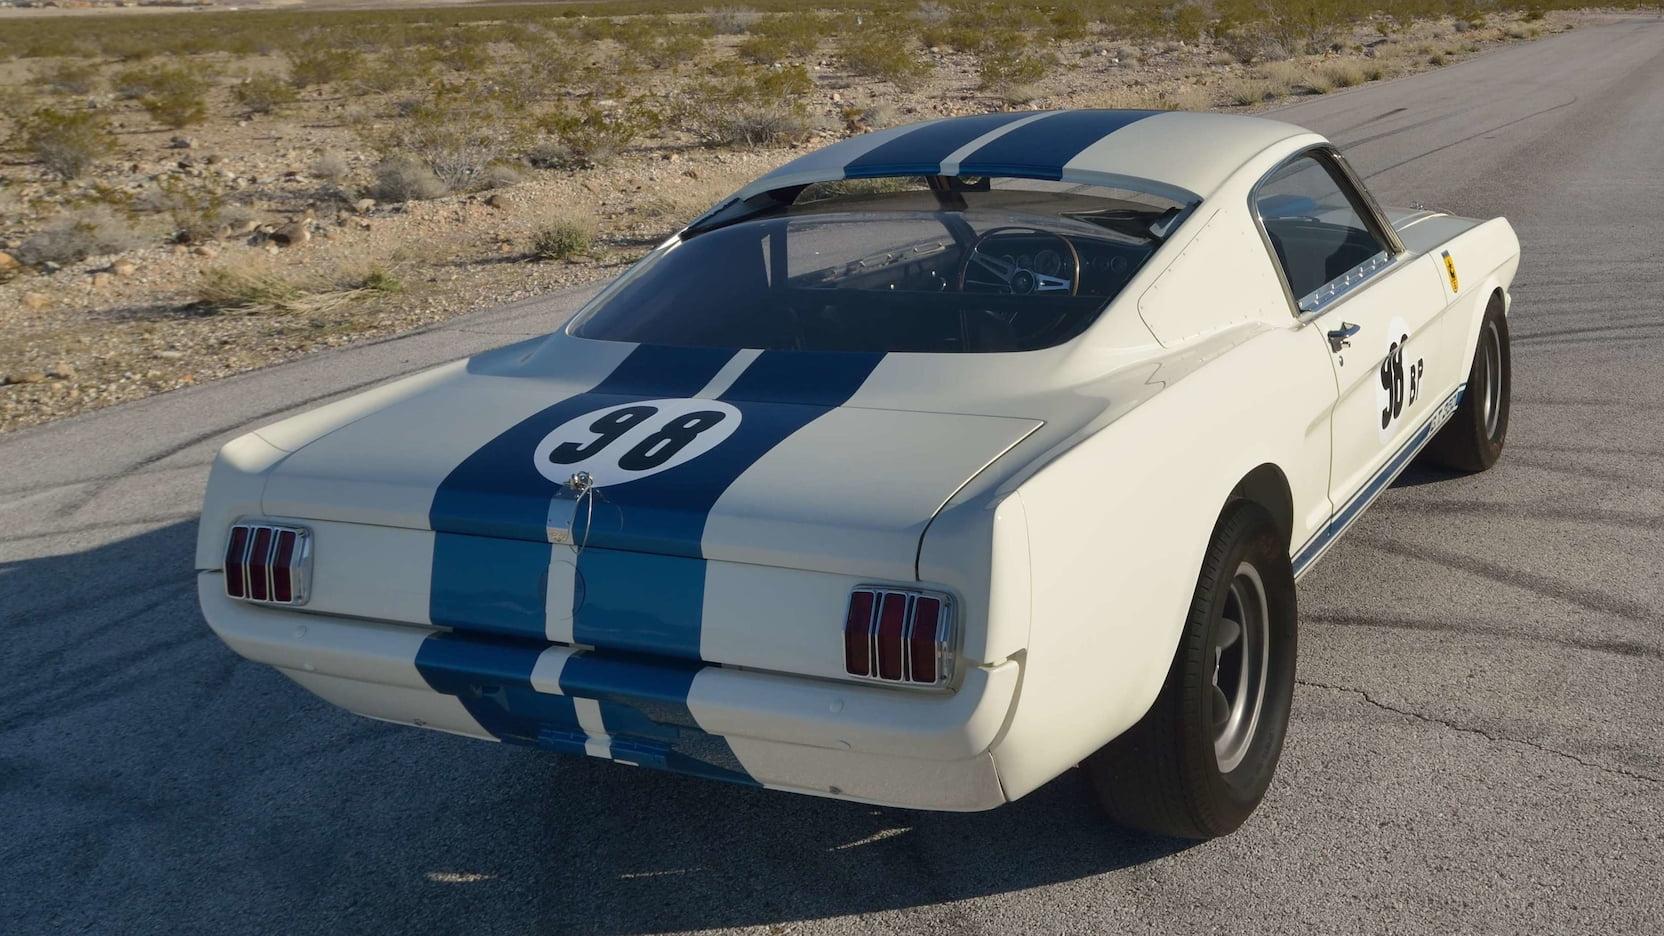 1965 Shelby GT350R Prototype Rear Three-Quarter